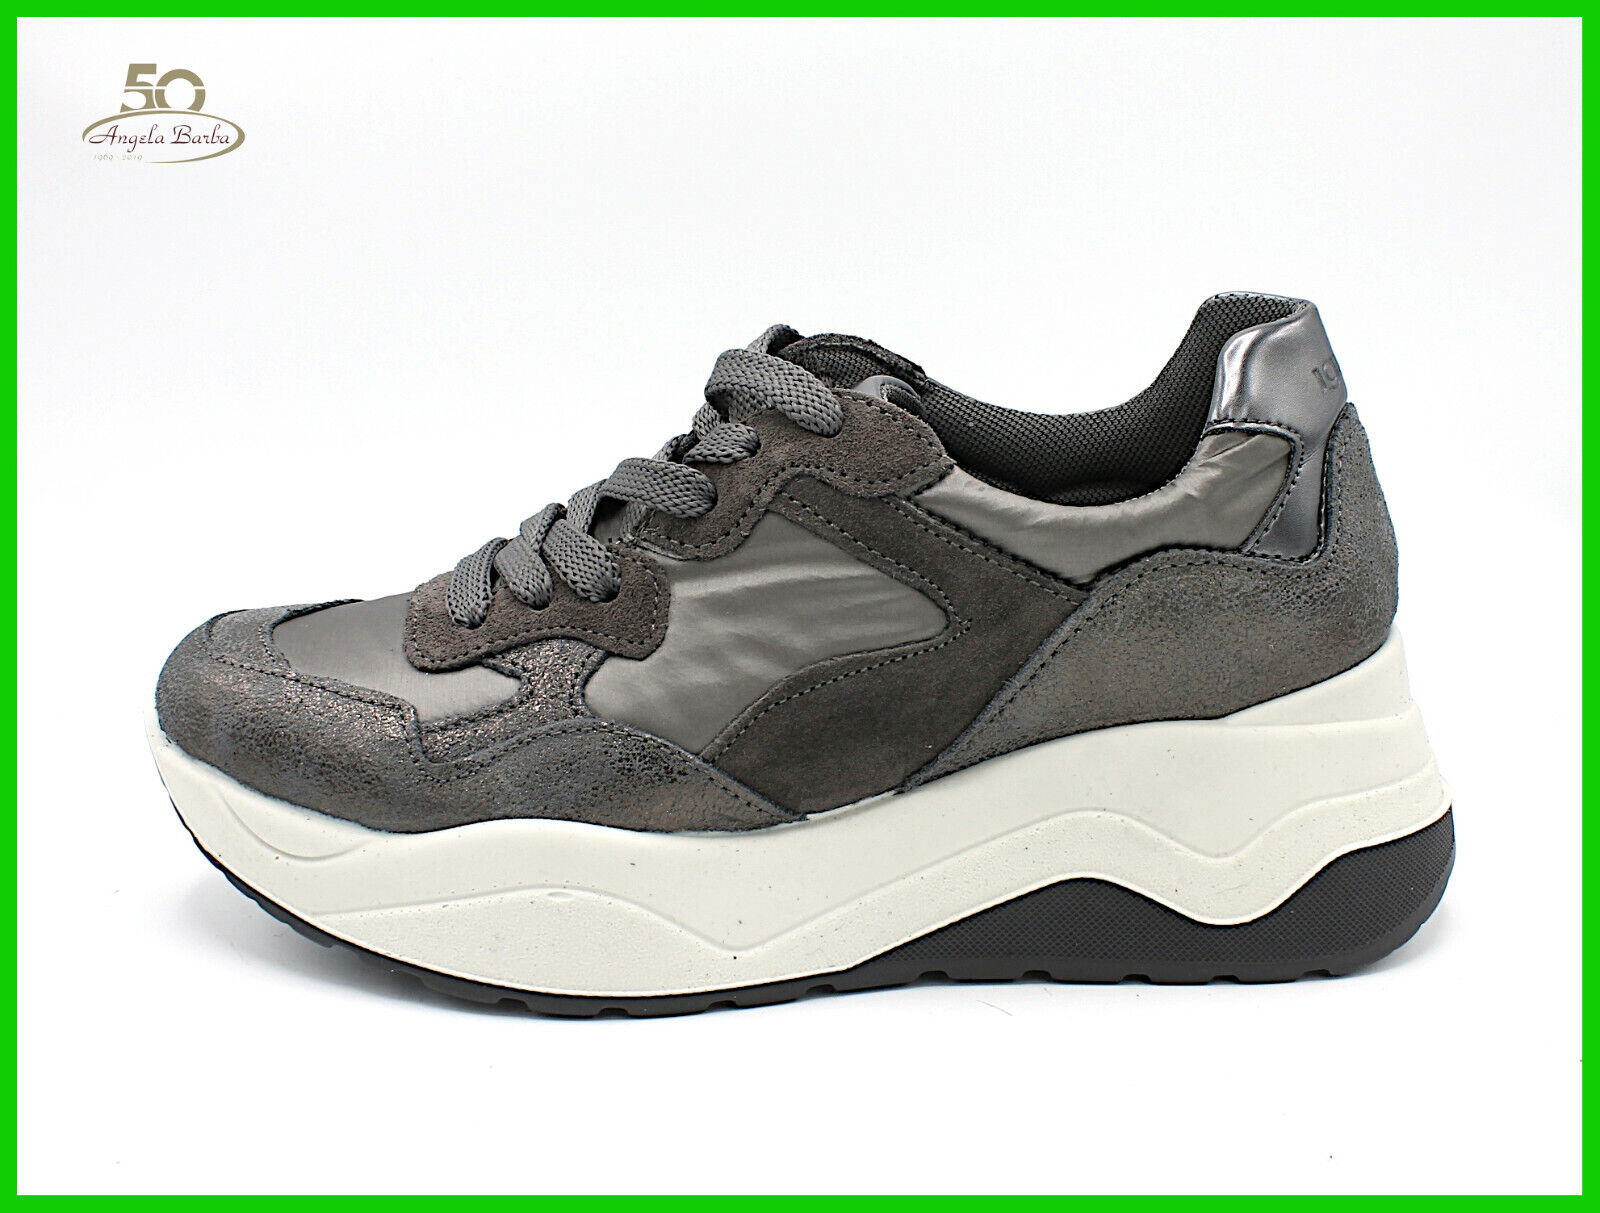 Turnschuhe Halbschuhe Sneaker weiß Echtleder Innen Damen Herren Unisex